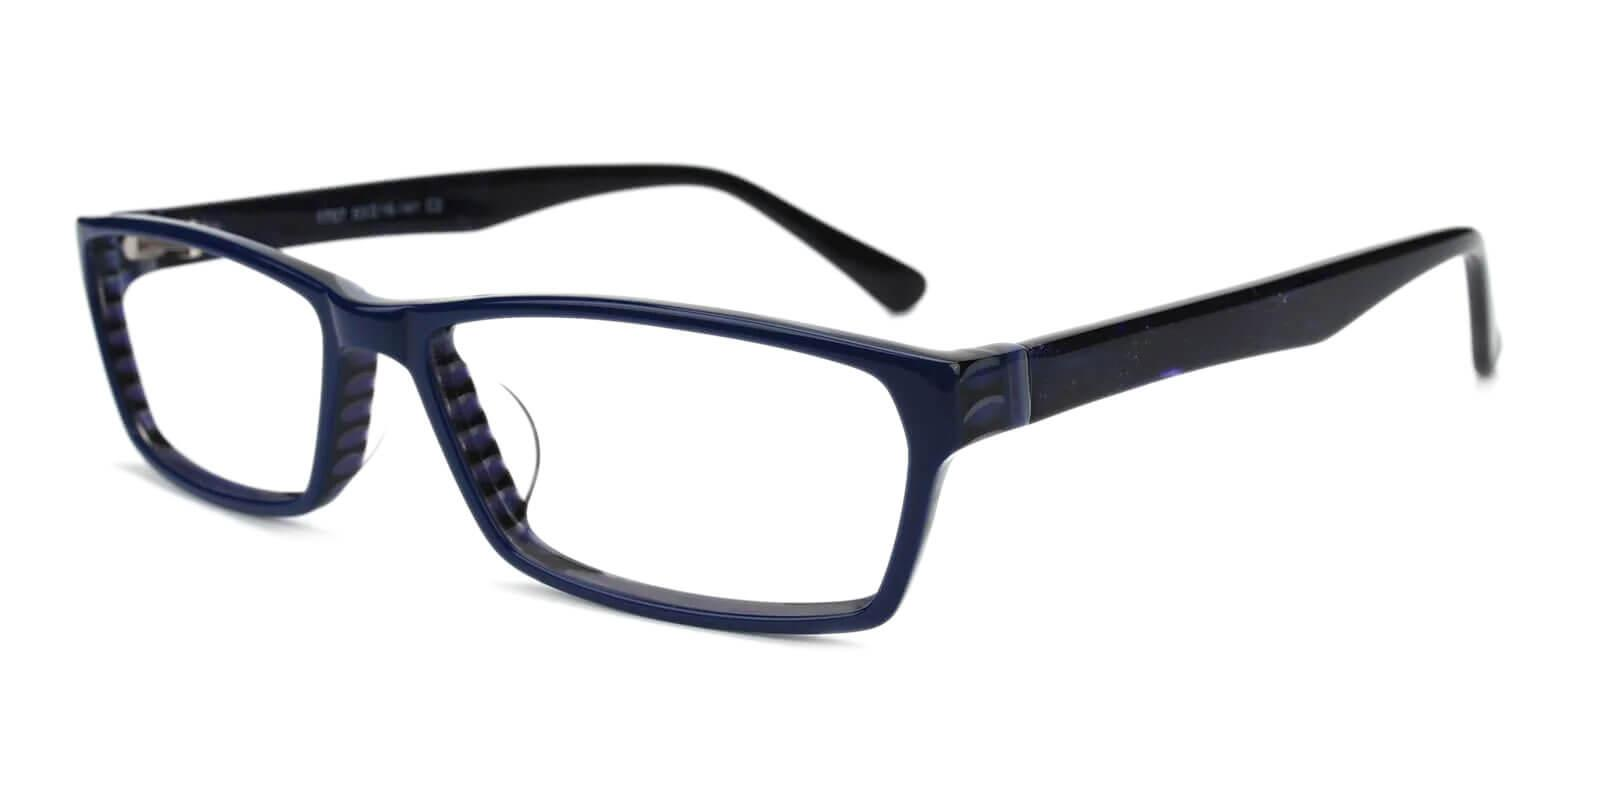 Weston Blue Acetate Eyeglasses , UniversalBridgeFit Frames from ABBE Glasses